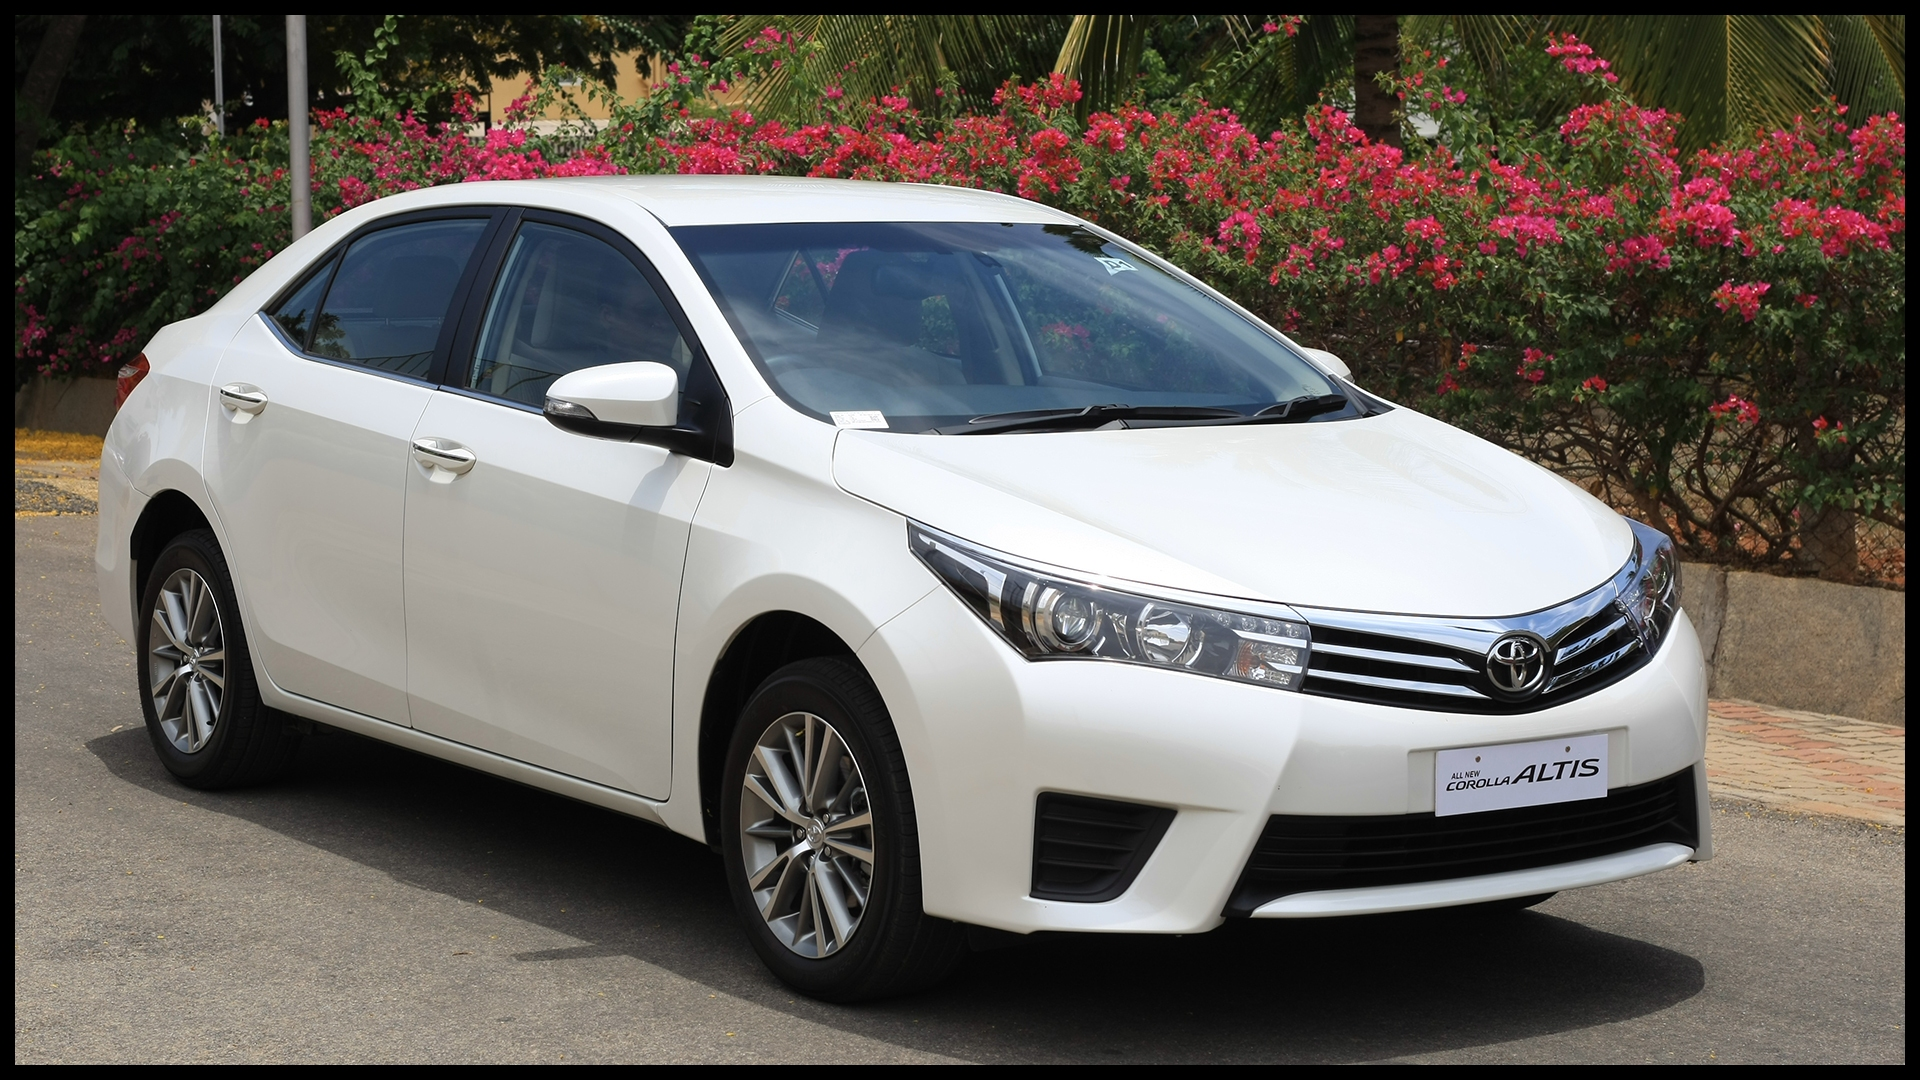 Toyota Corolla Altis 2014 Exterior